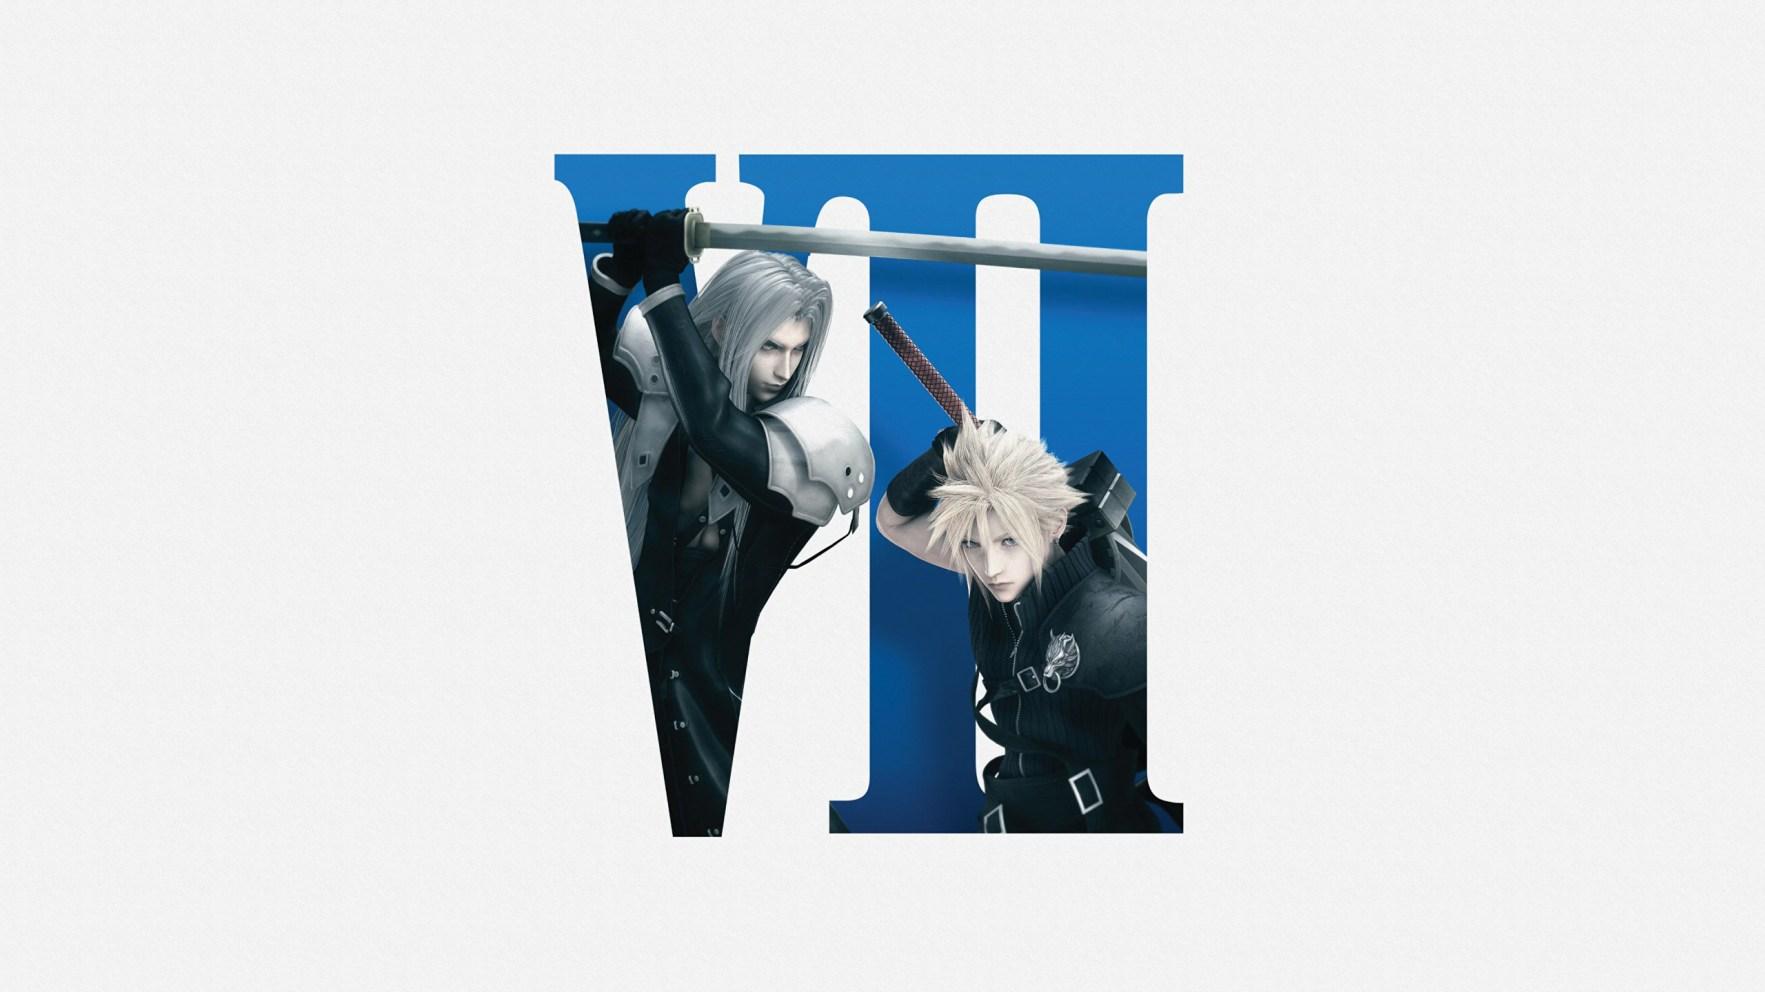 Lightning Returns Wallpaper Hd Get A Fancy Final Fantasy Vii Wallpaper Featuring New Cgi